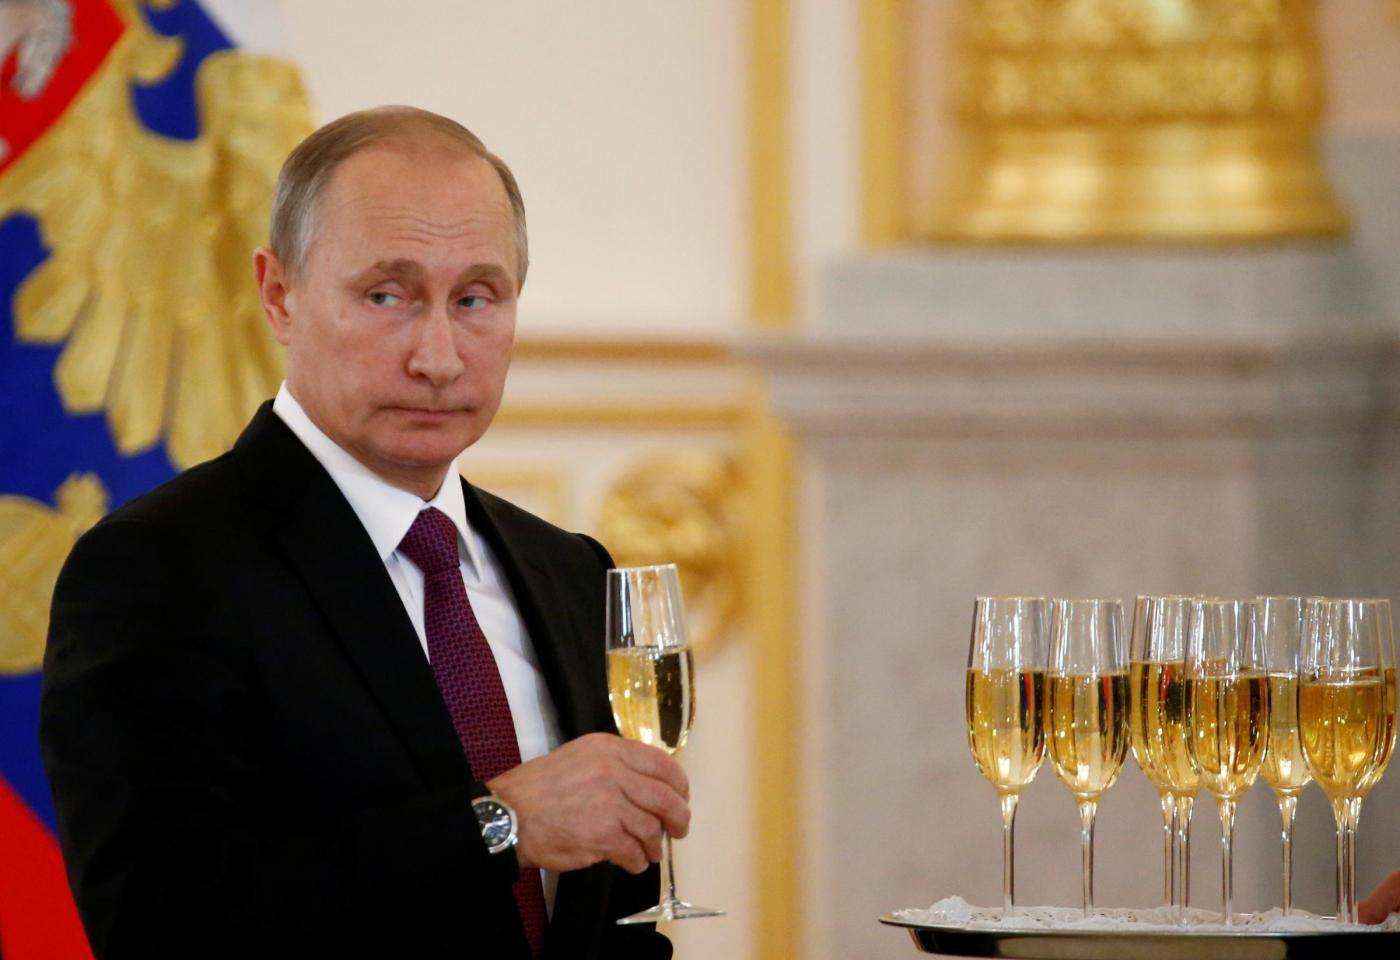 Mosca, il presidente Putin riceve gli ambasciatori stranieri al Cremlino